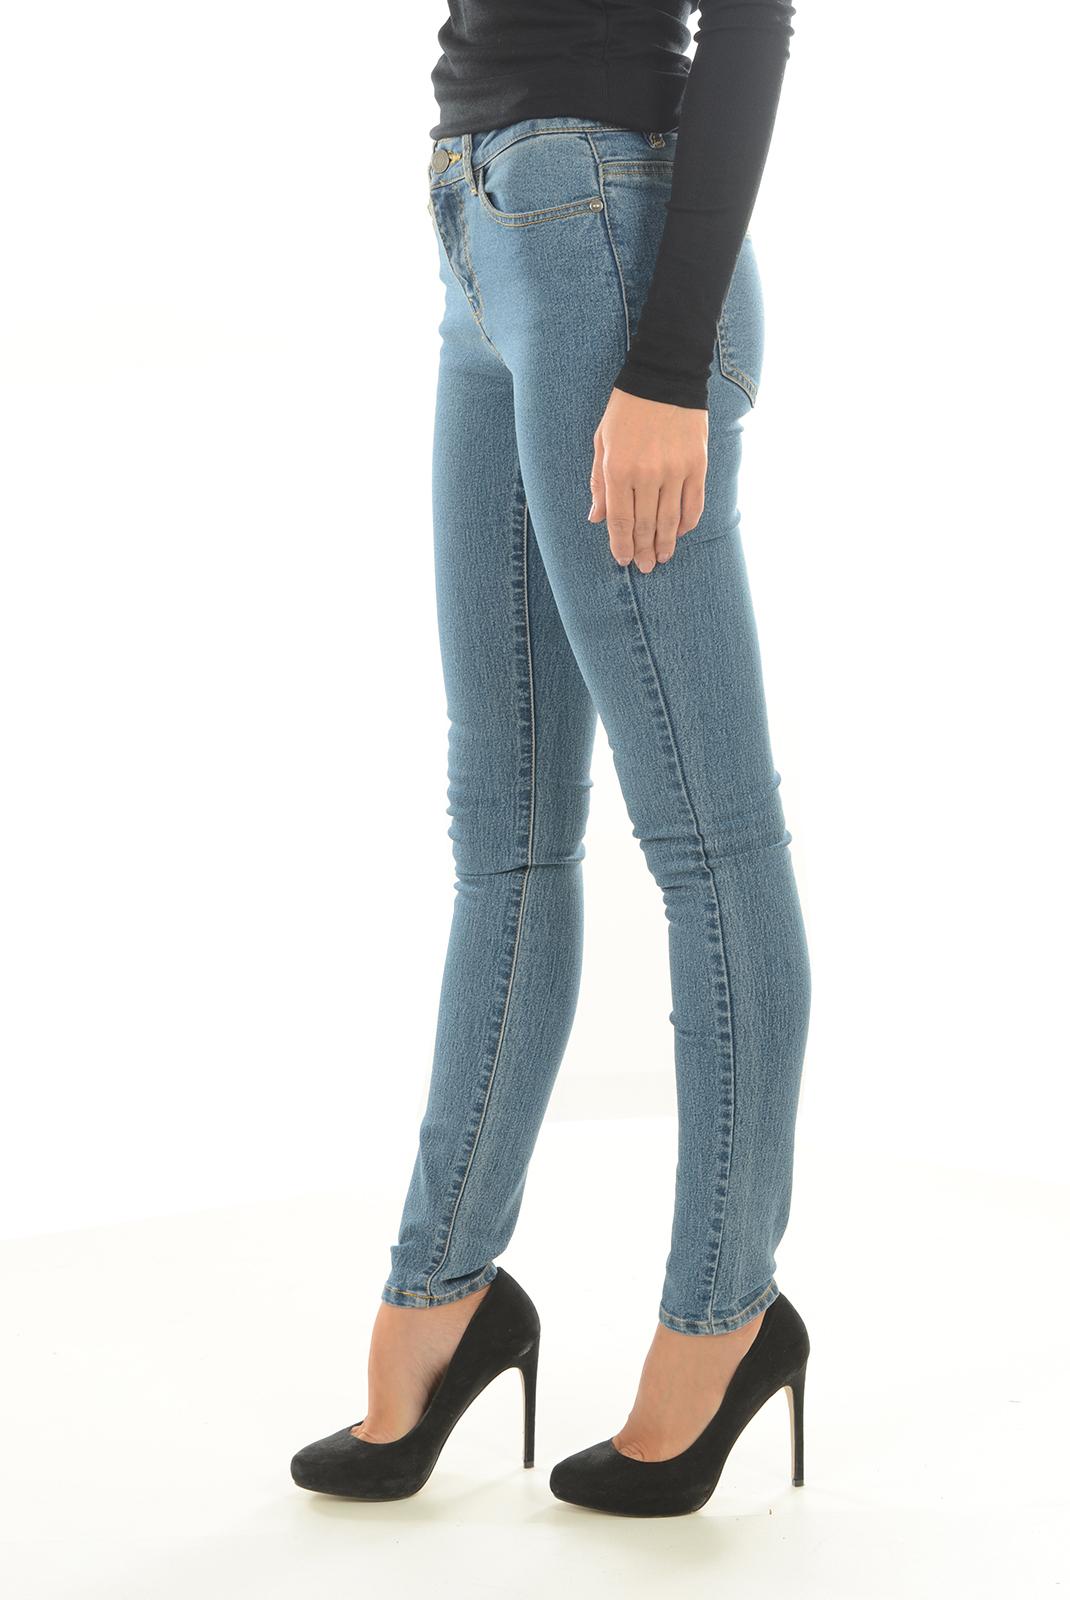 Jeans   Noisy May LUCY NW SLIM JEANS GU814 NOOS MEDIUM BLUE DENIM